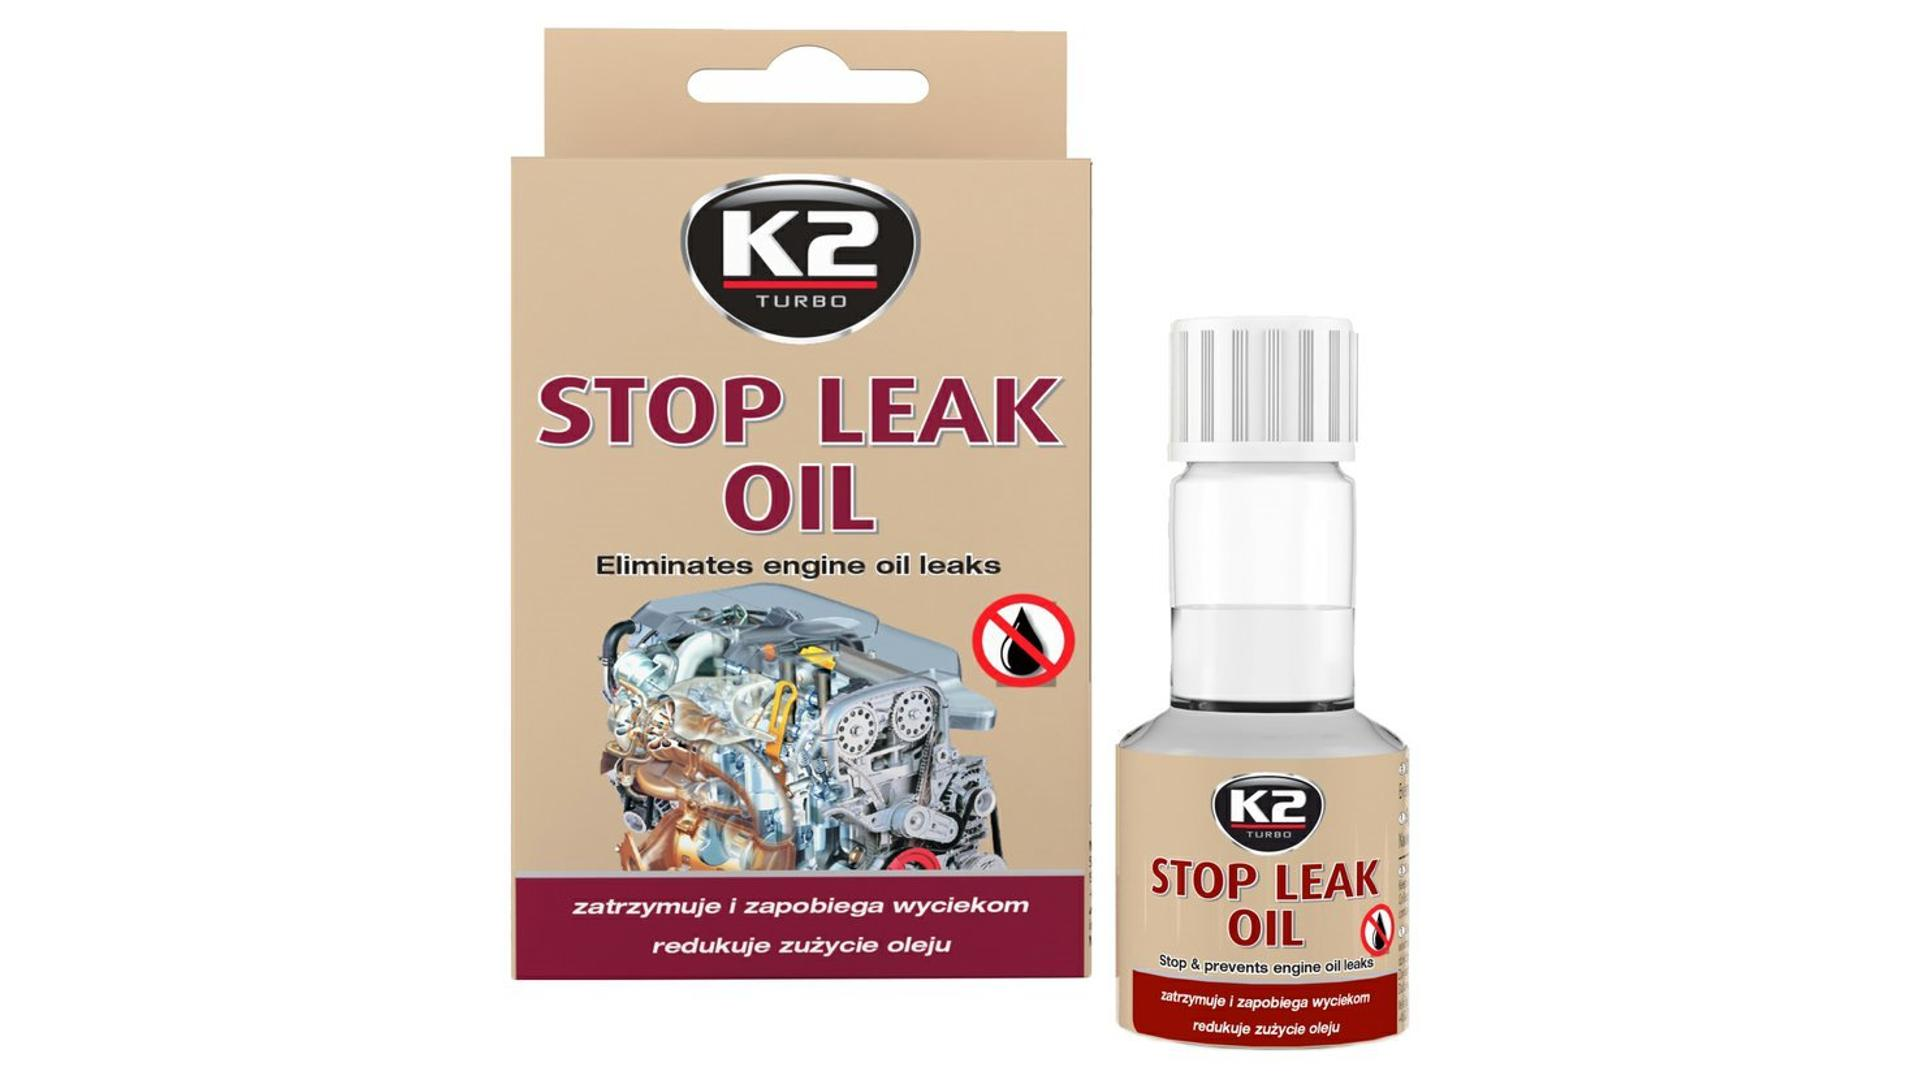 K2 STOP LEAK OIL 50ml - zamezuje únikům oleje z motoru